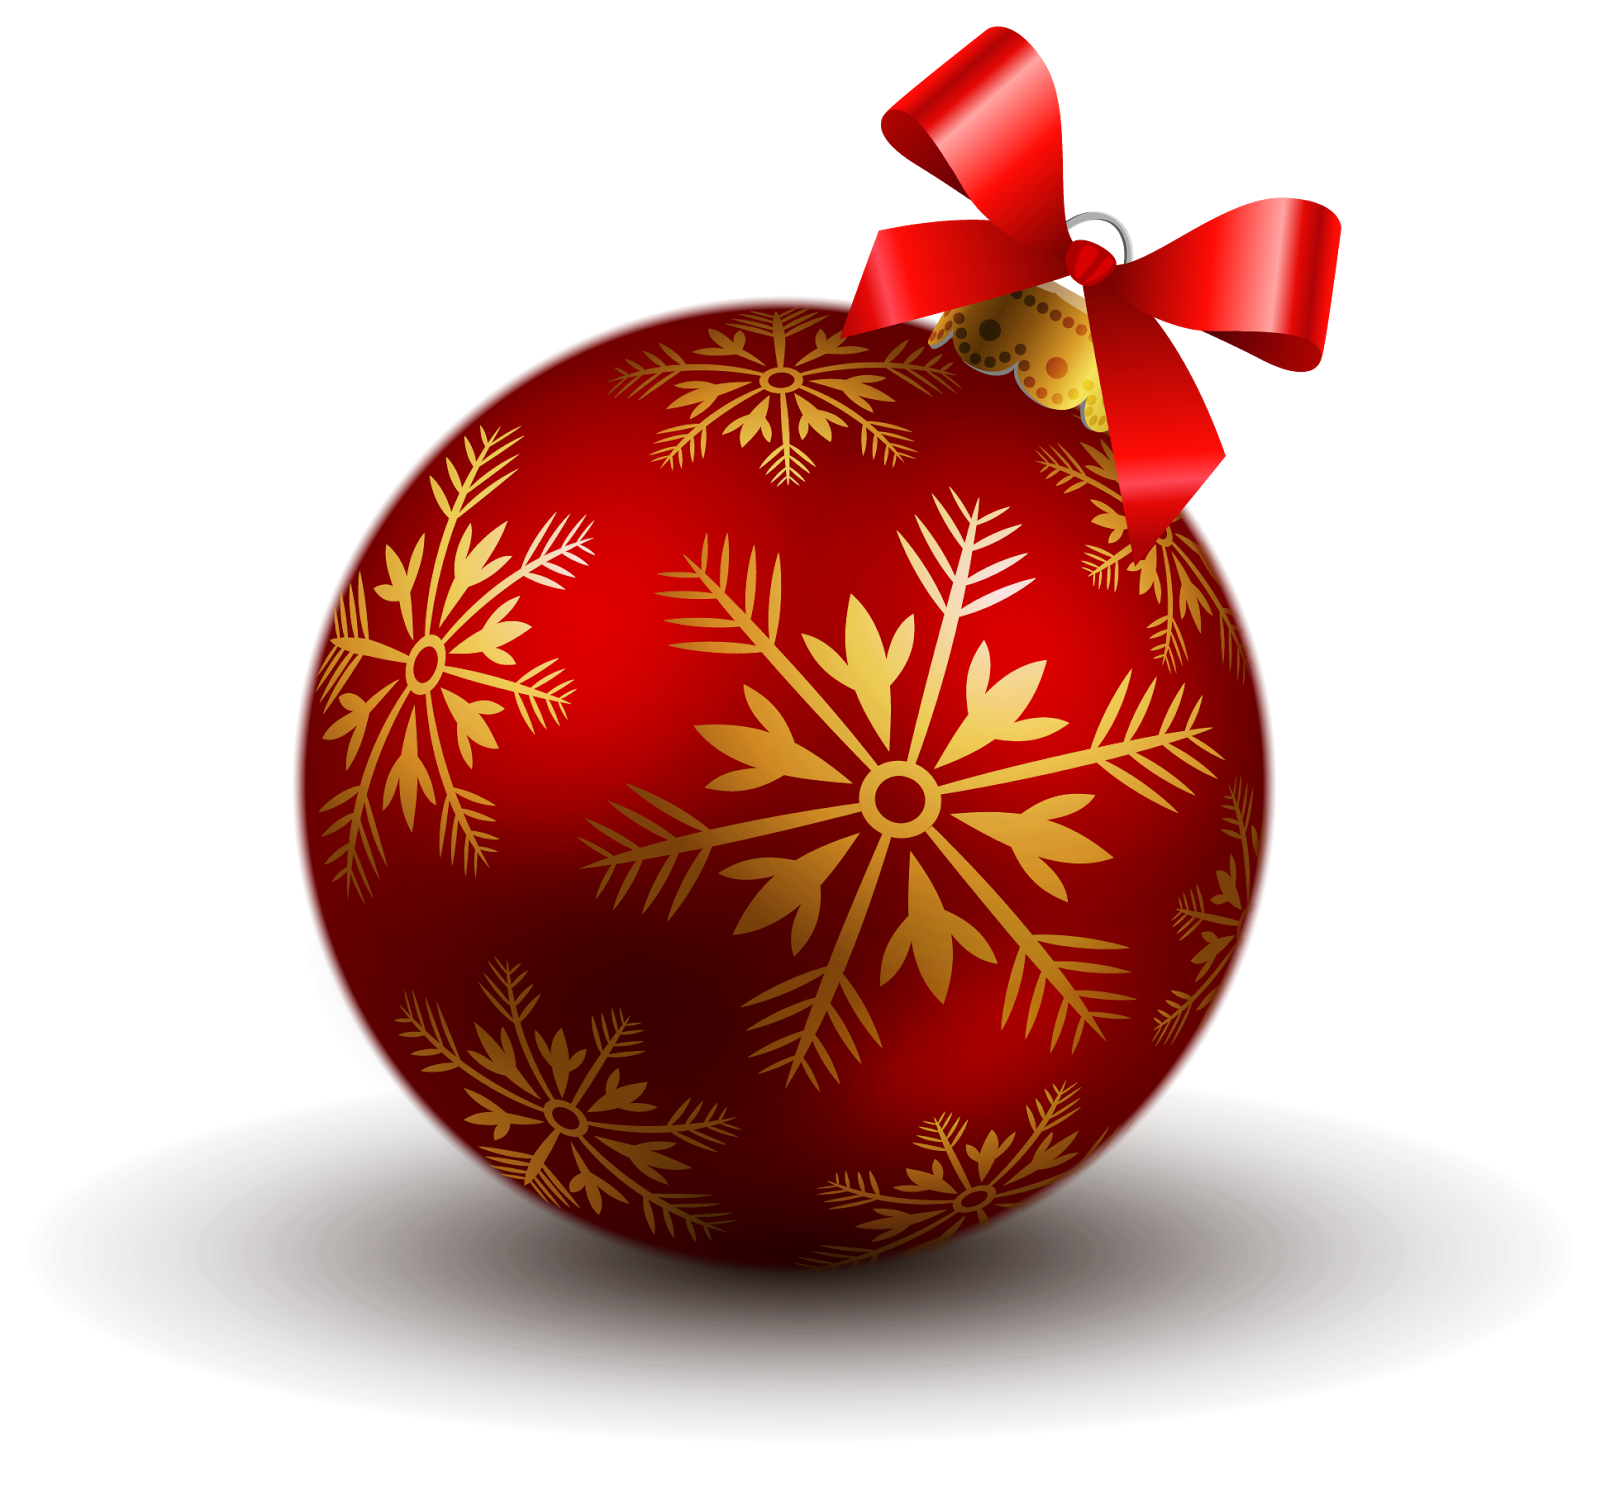 Michigan Medical Marijuana Report The Christmas Wish List  by